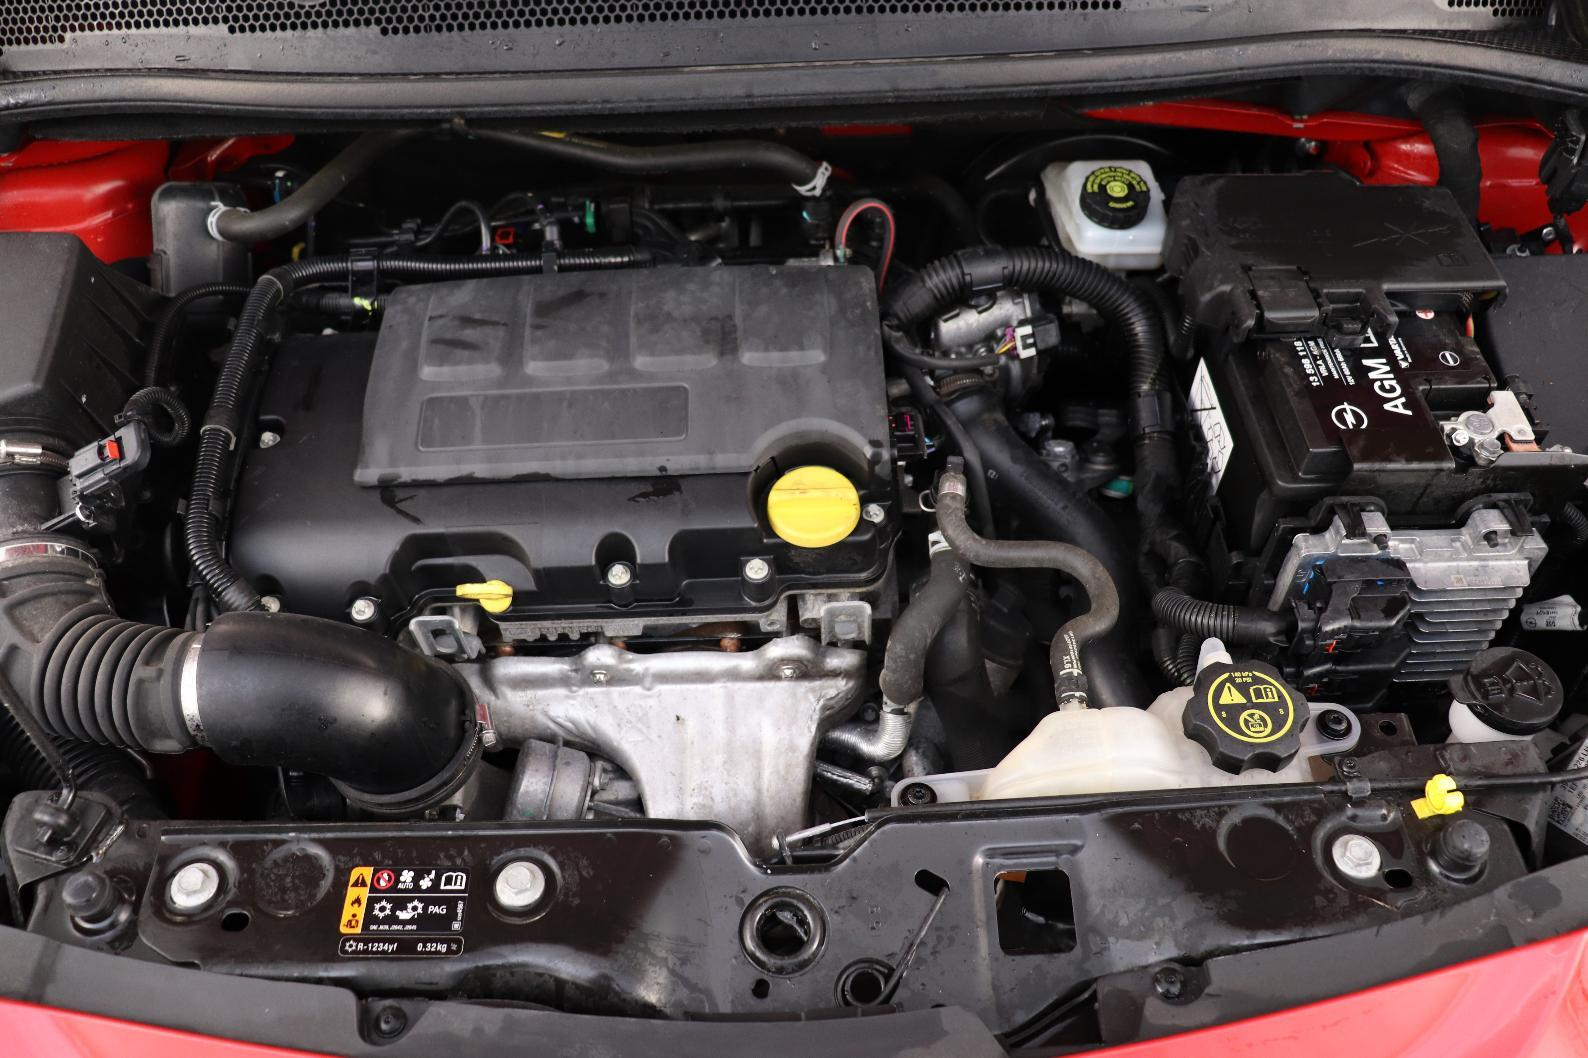 OPEL CORSA 1.4 Turbo 100 ch Black Edition